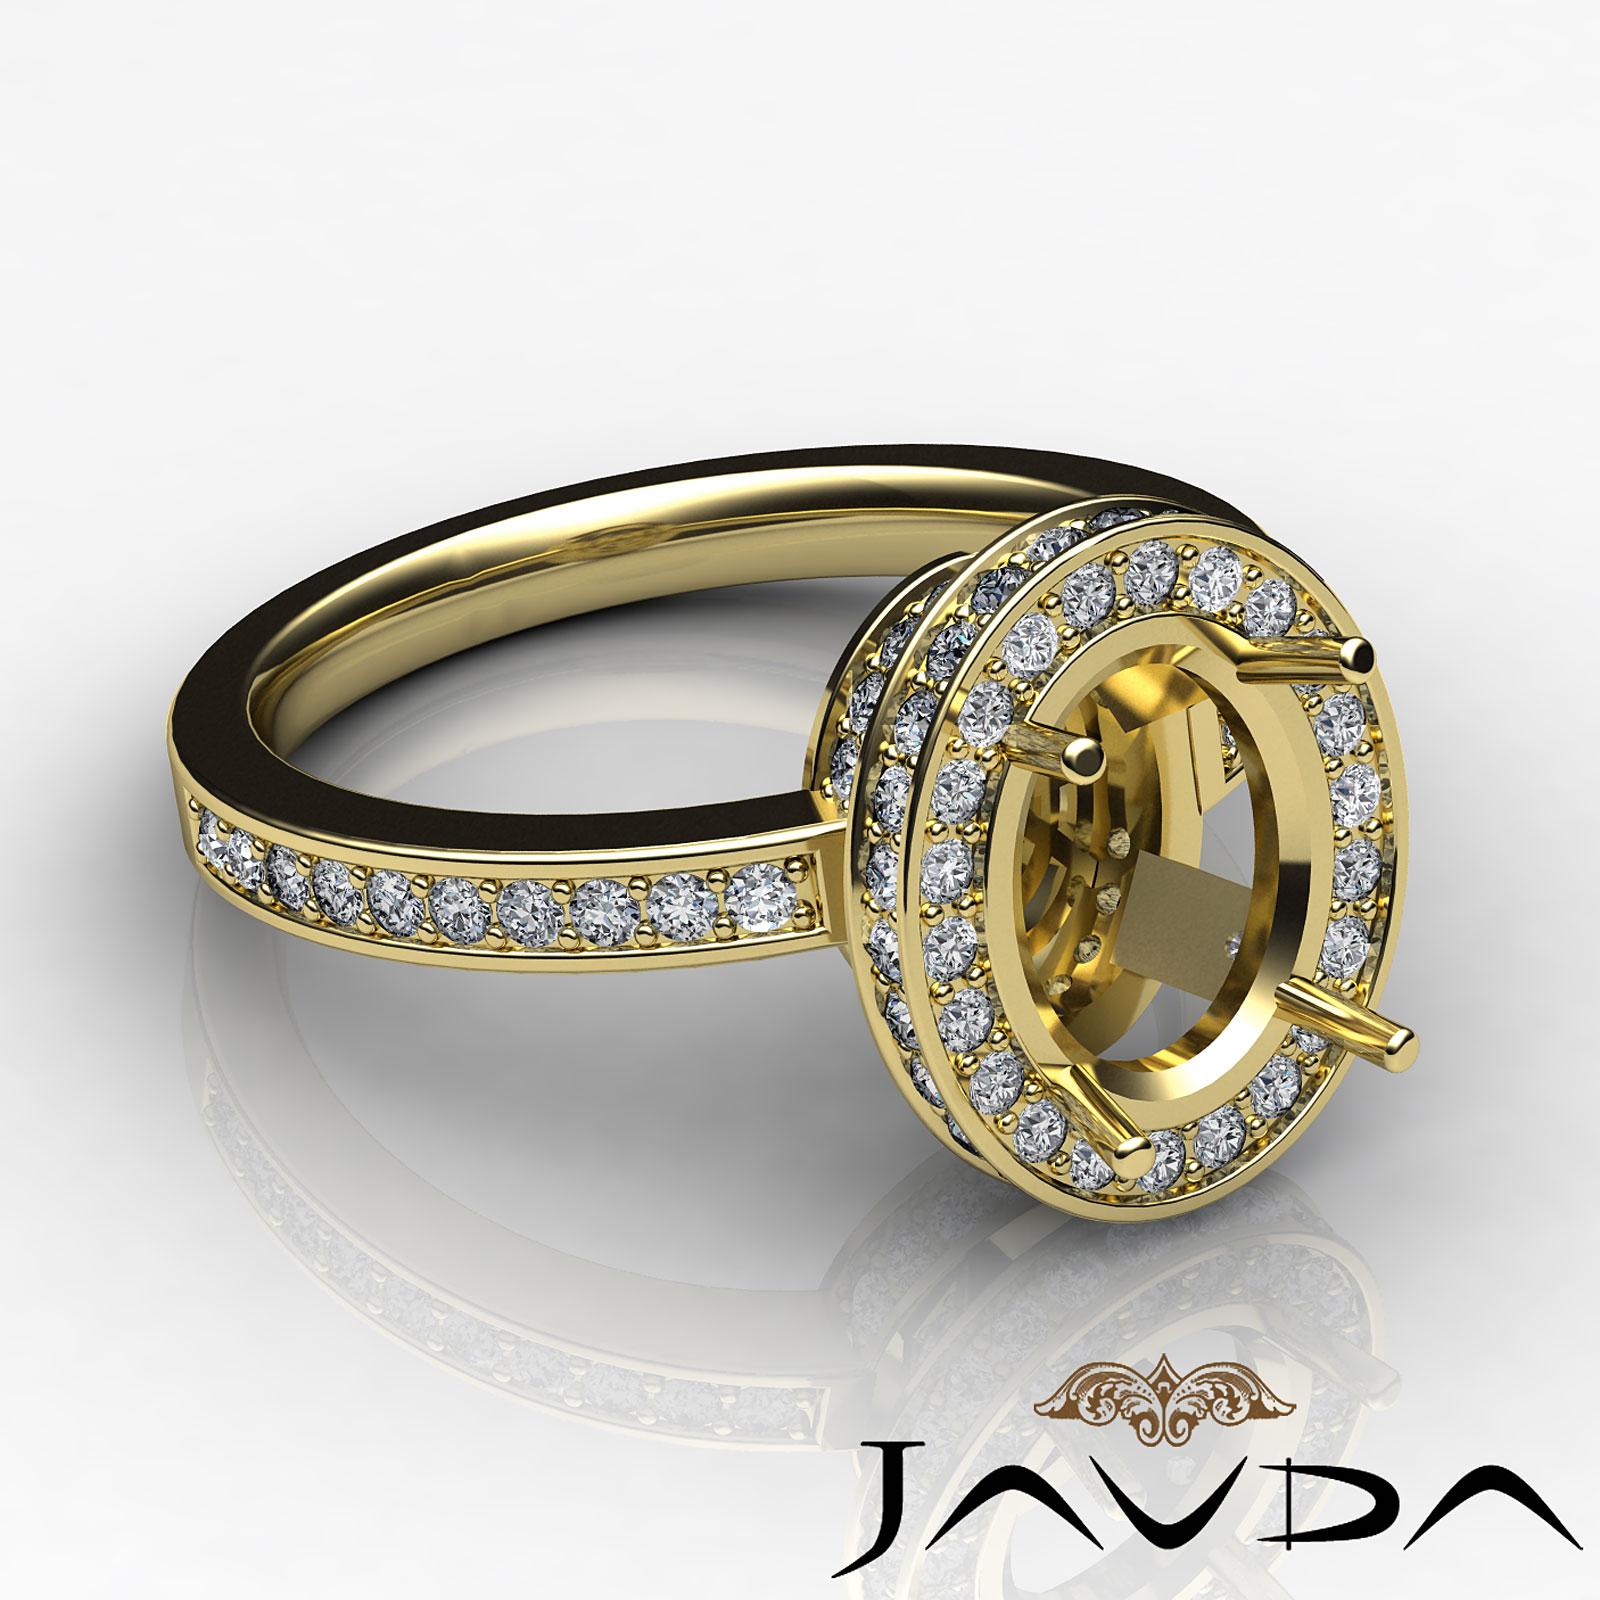 diamond anniversary ring oval shape semi mount 18k yellow. Black Bedroom Furniture Sets. Home Design Ideas